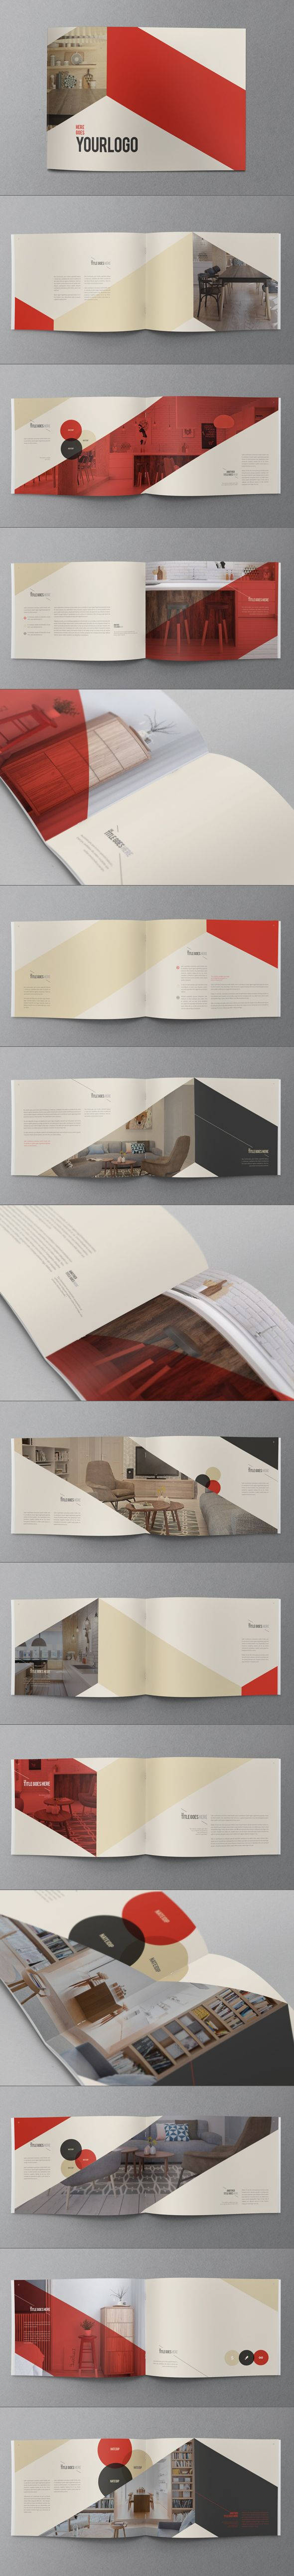 Retro Vintage Brochure. Download here: http://graphicriver.net/item/retro-vintage-brochure/9248518?ref=abradesign #brochure #design